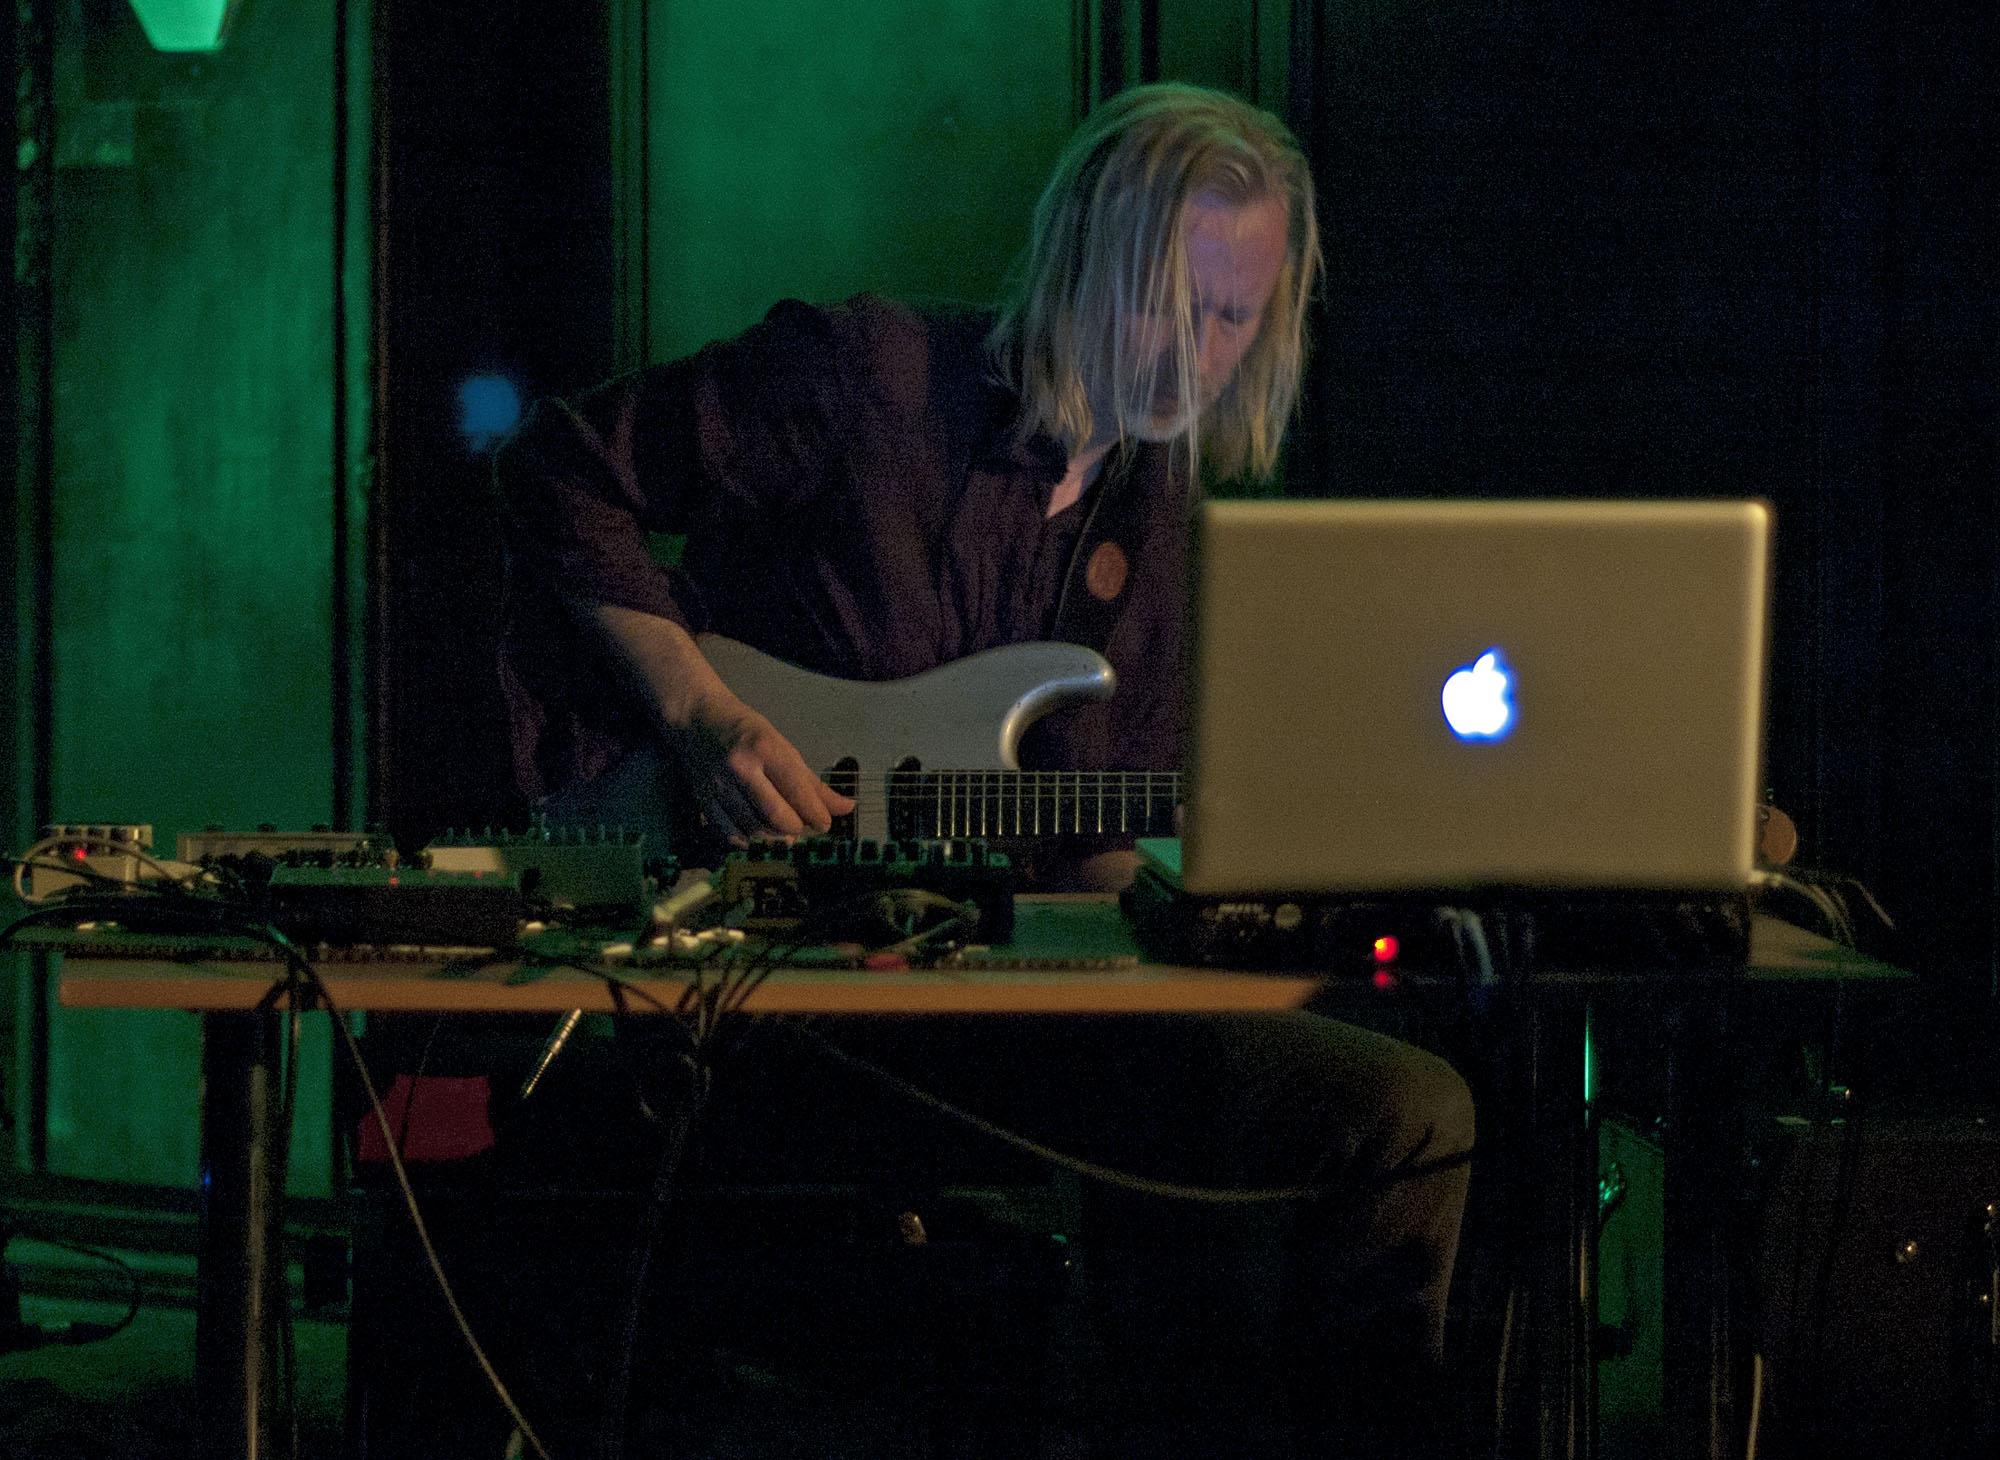 Eivind Aarset, Punkt in Tallinn, April 2011